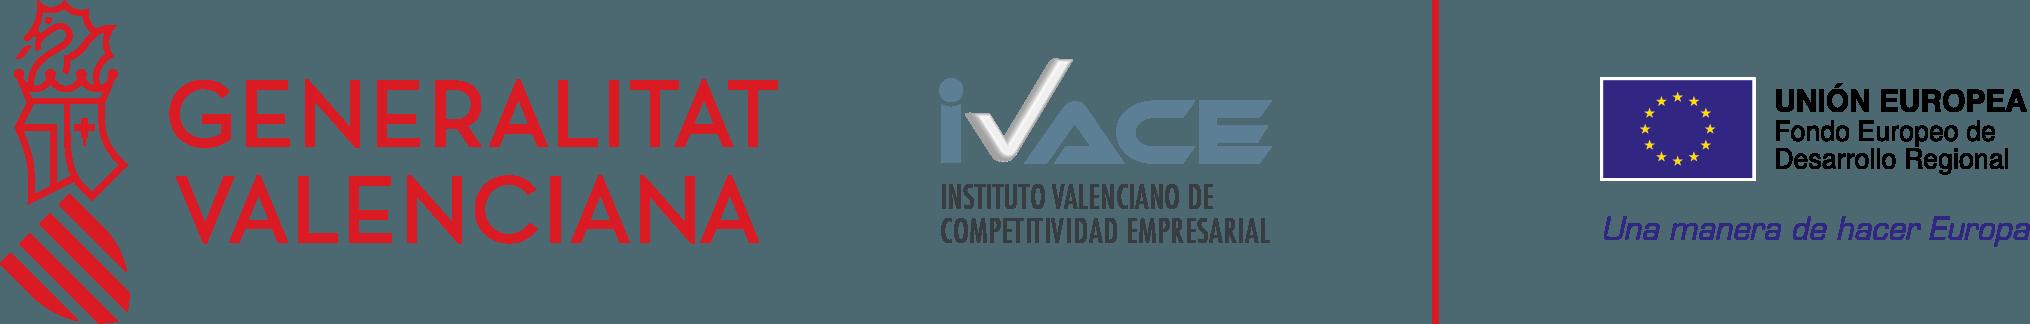 Logo fondos FEDER - IVACE